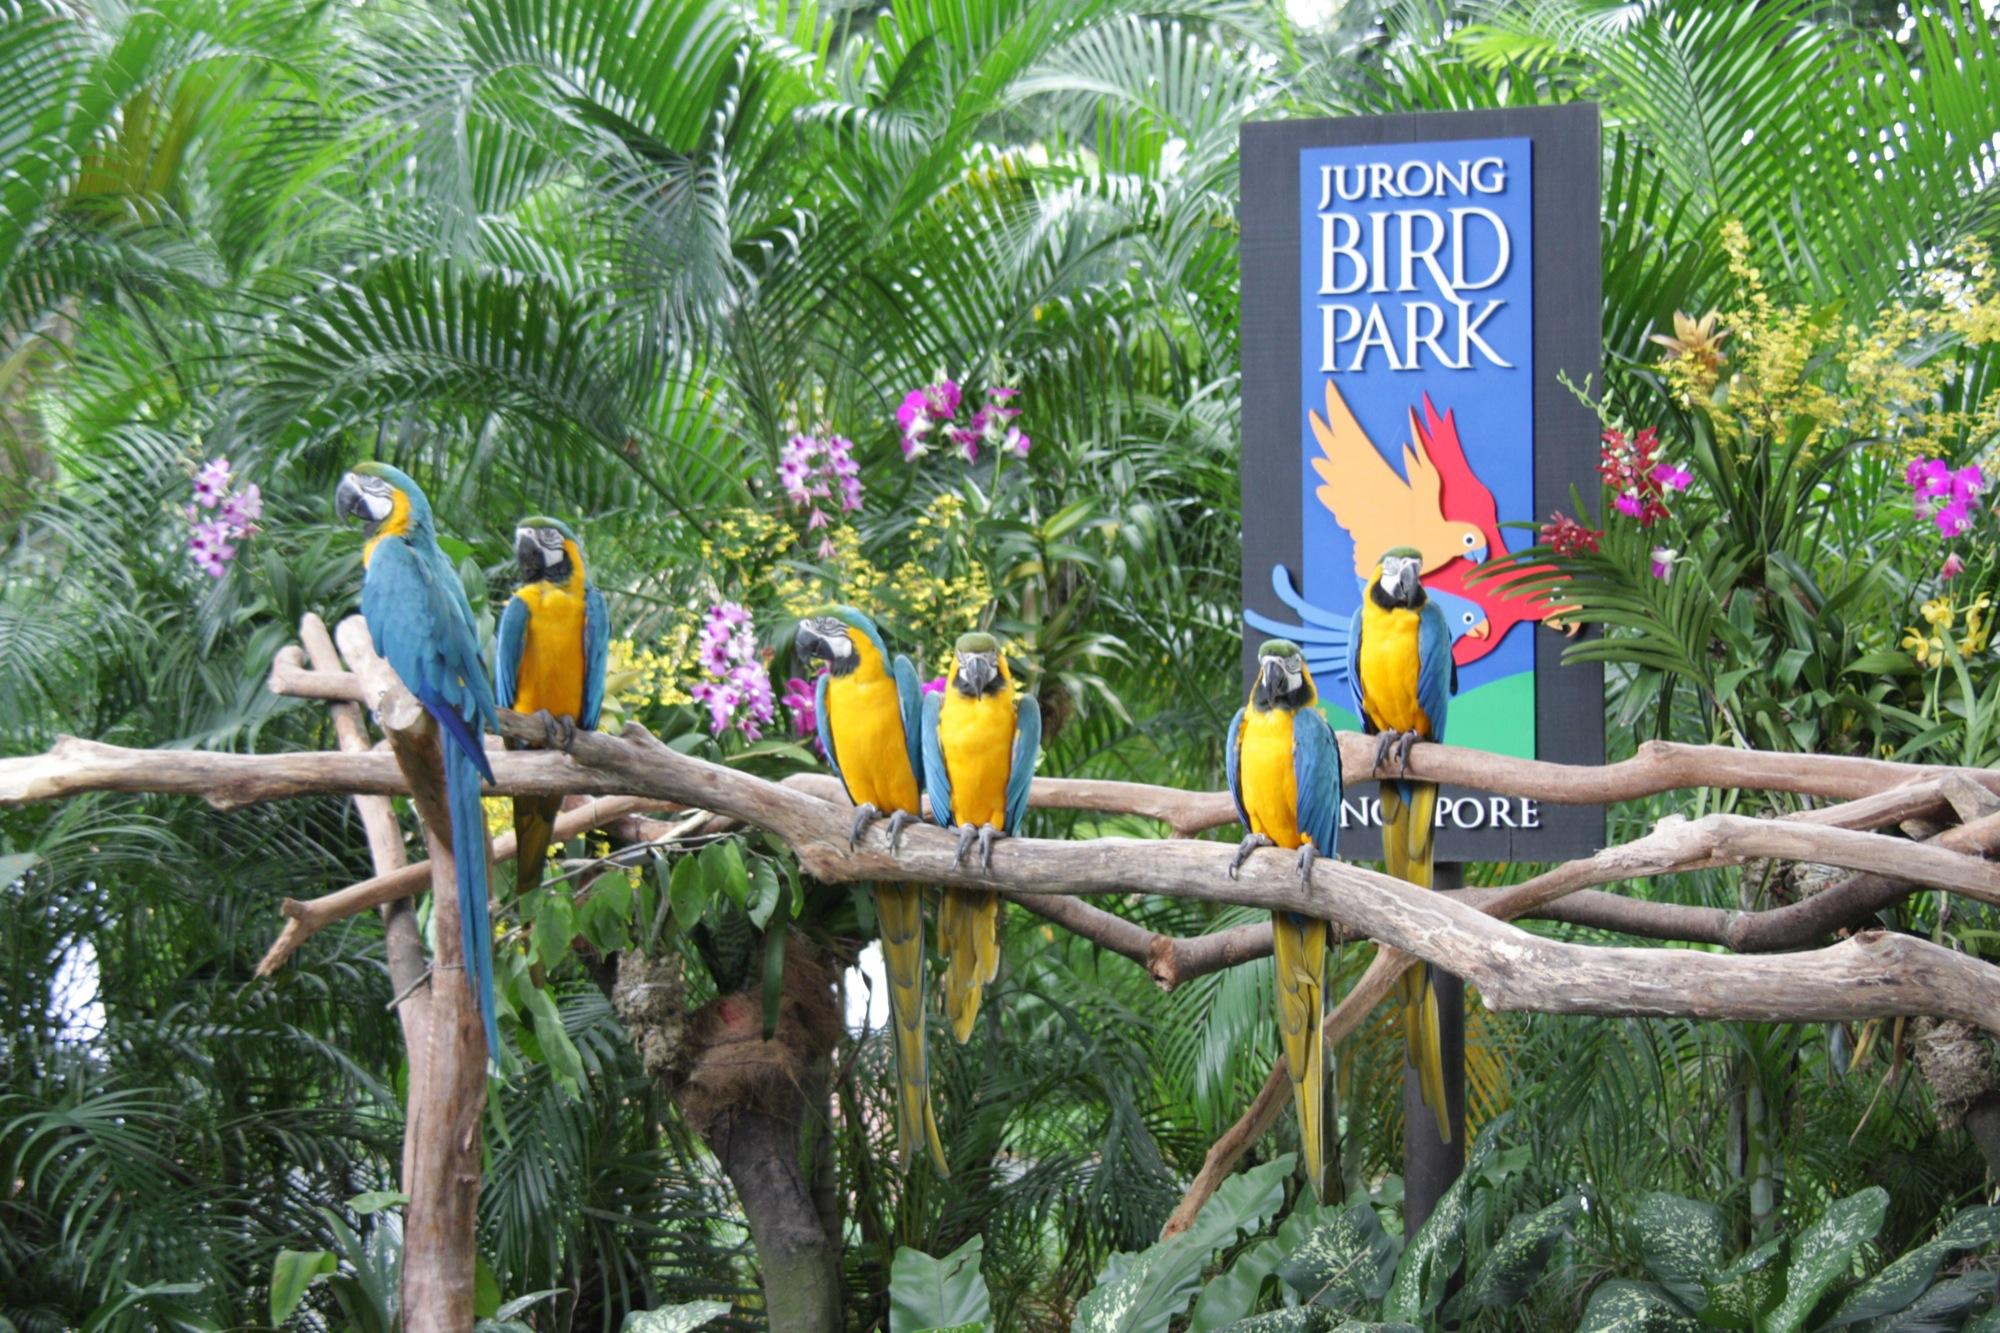 Ara_ararauna_-Jurong_Bird_Park_-sign-8a